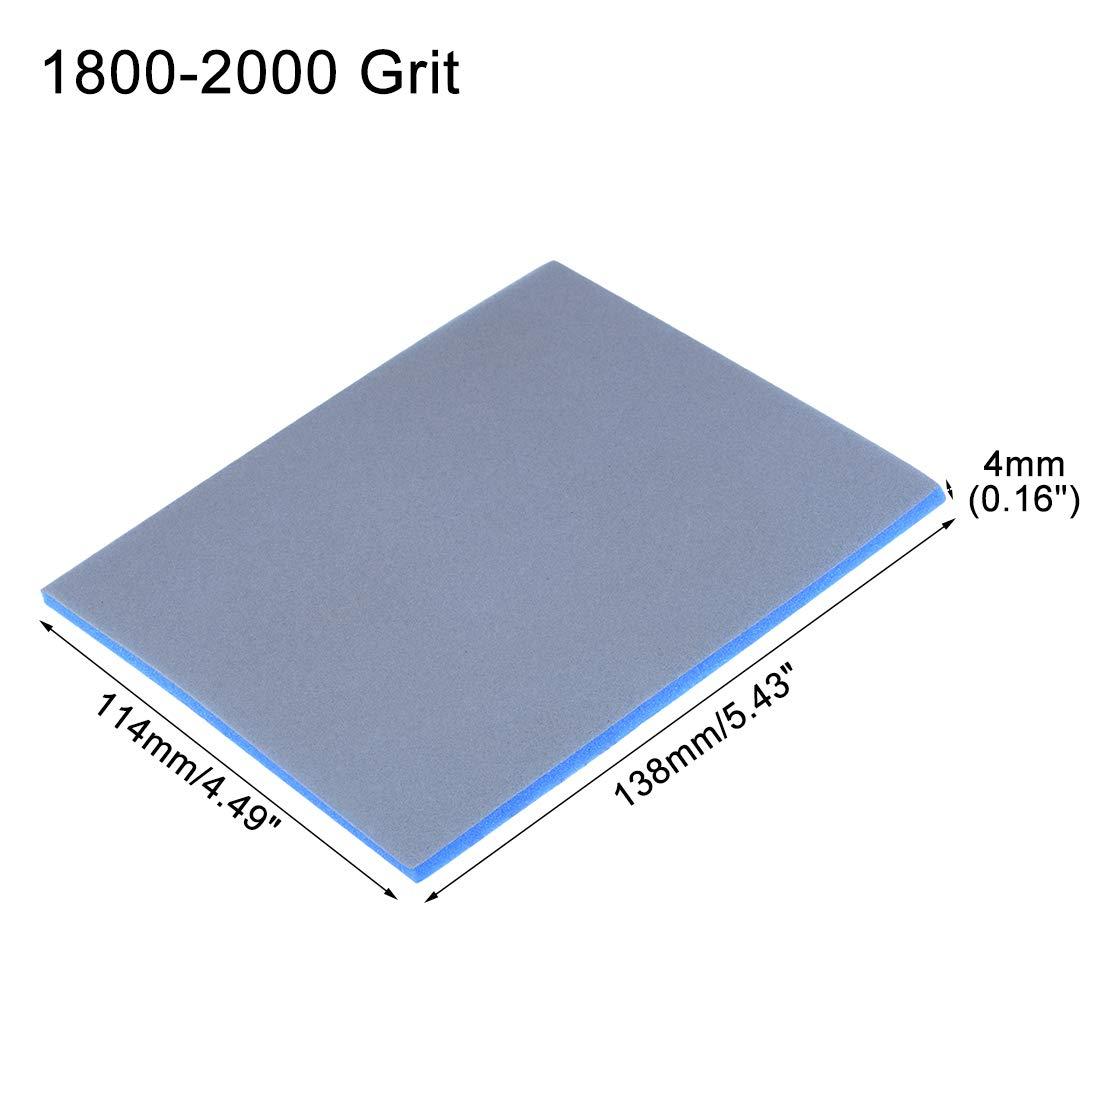 140mmx112mmx5mm /éponge Bloc pon/çage grain 600